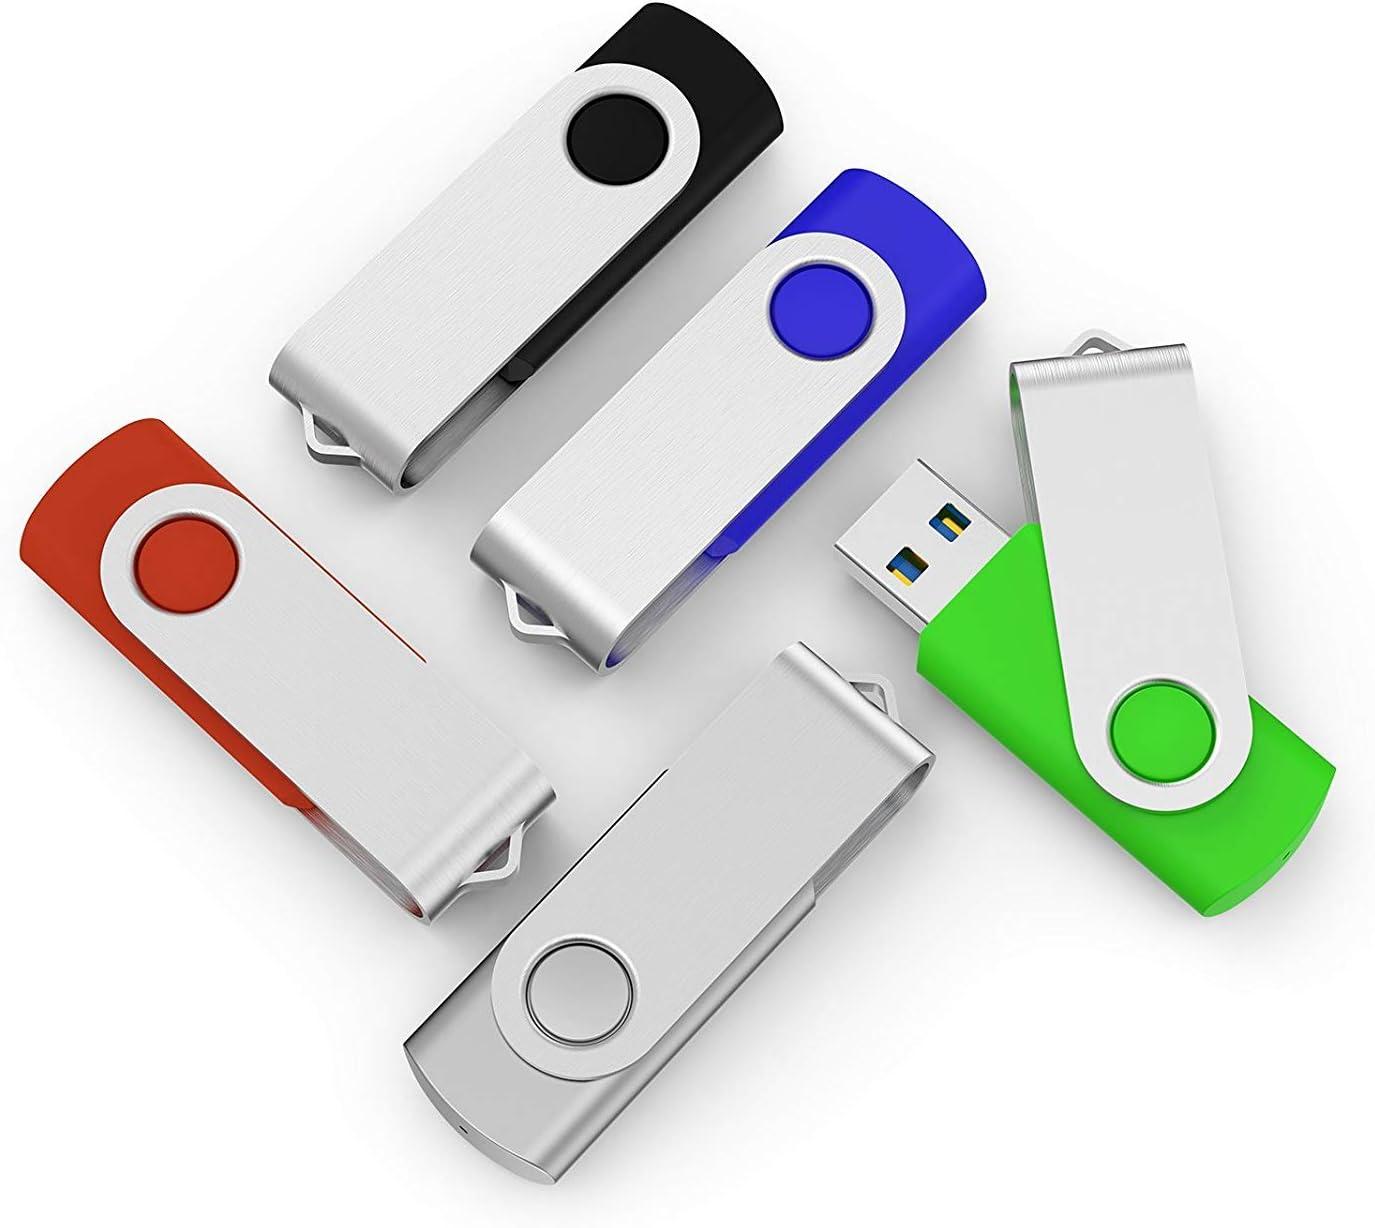 20X 512MB 16MB-32GB USB 2.0 New Thumb Drive Wholesale//Lot Flash Memory 20 Pack - U Disk